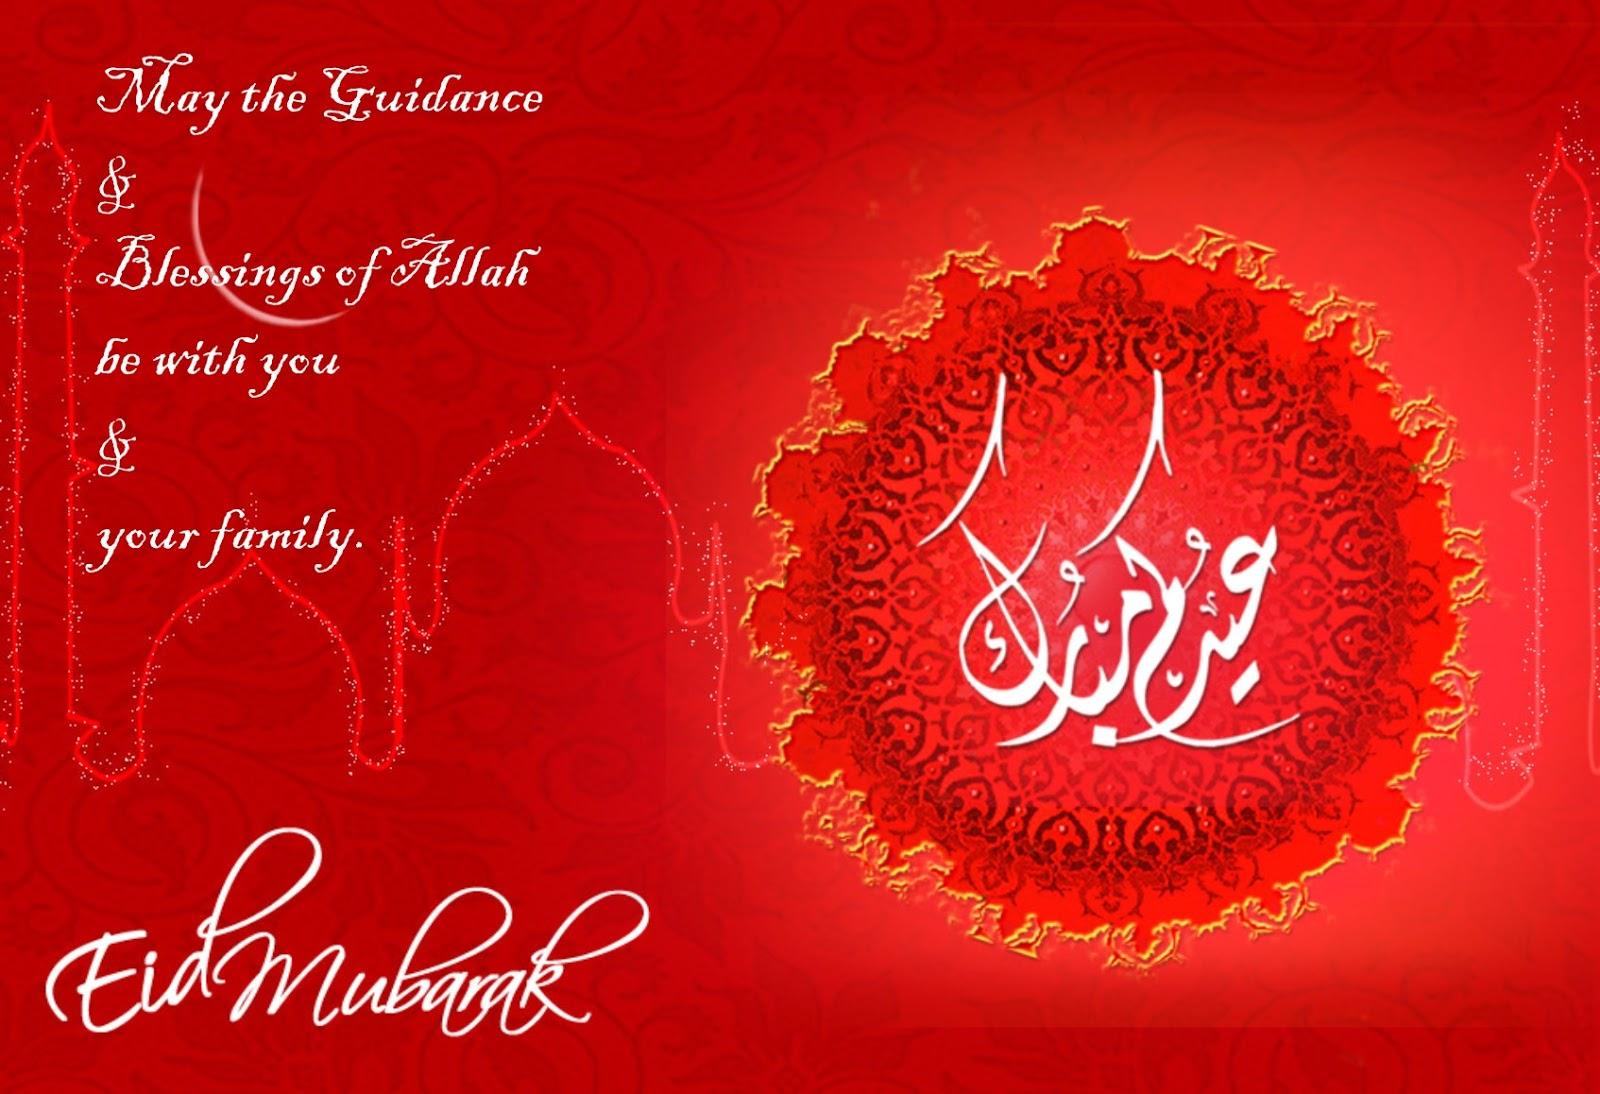 Eid Mubarak Cards Free Download Happy Bakra Eid Mubarak 2013 Best